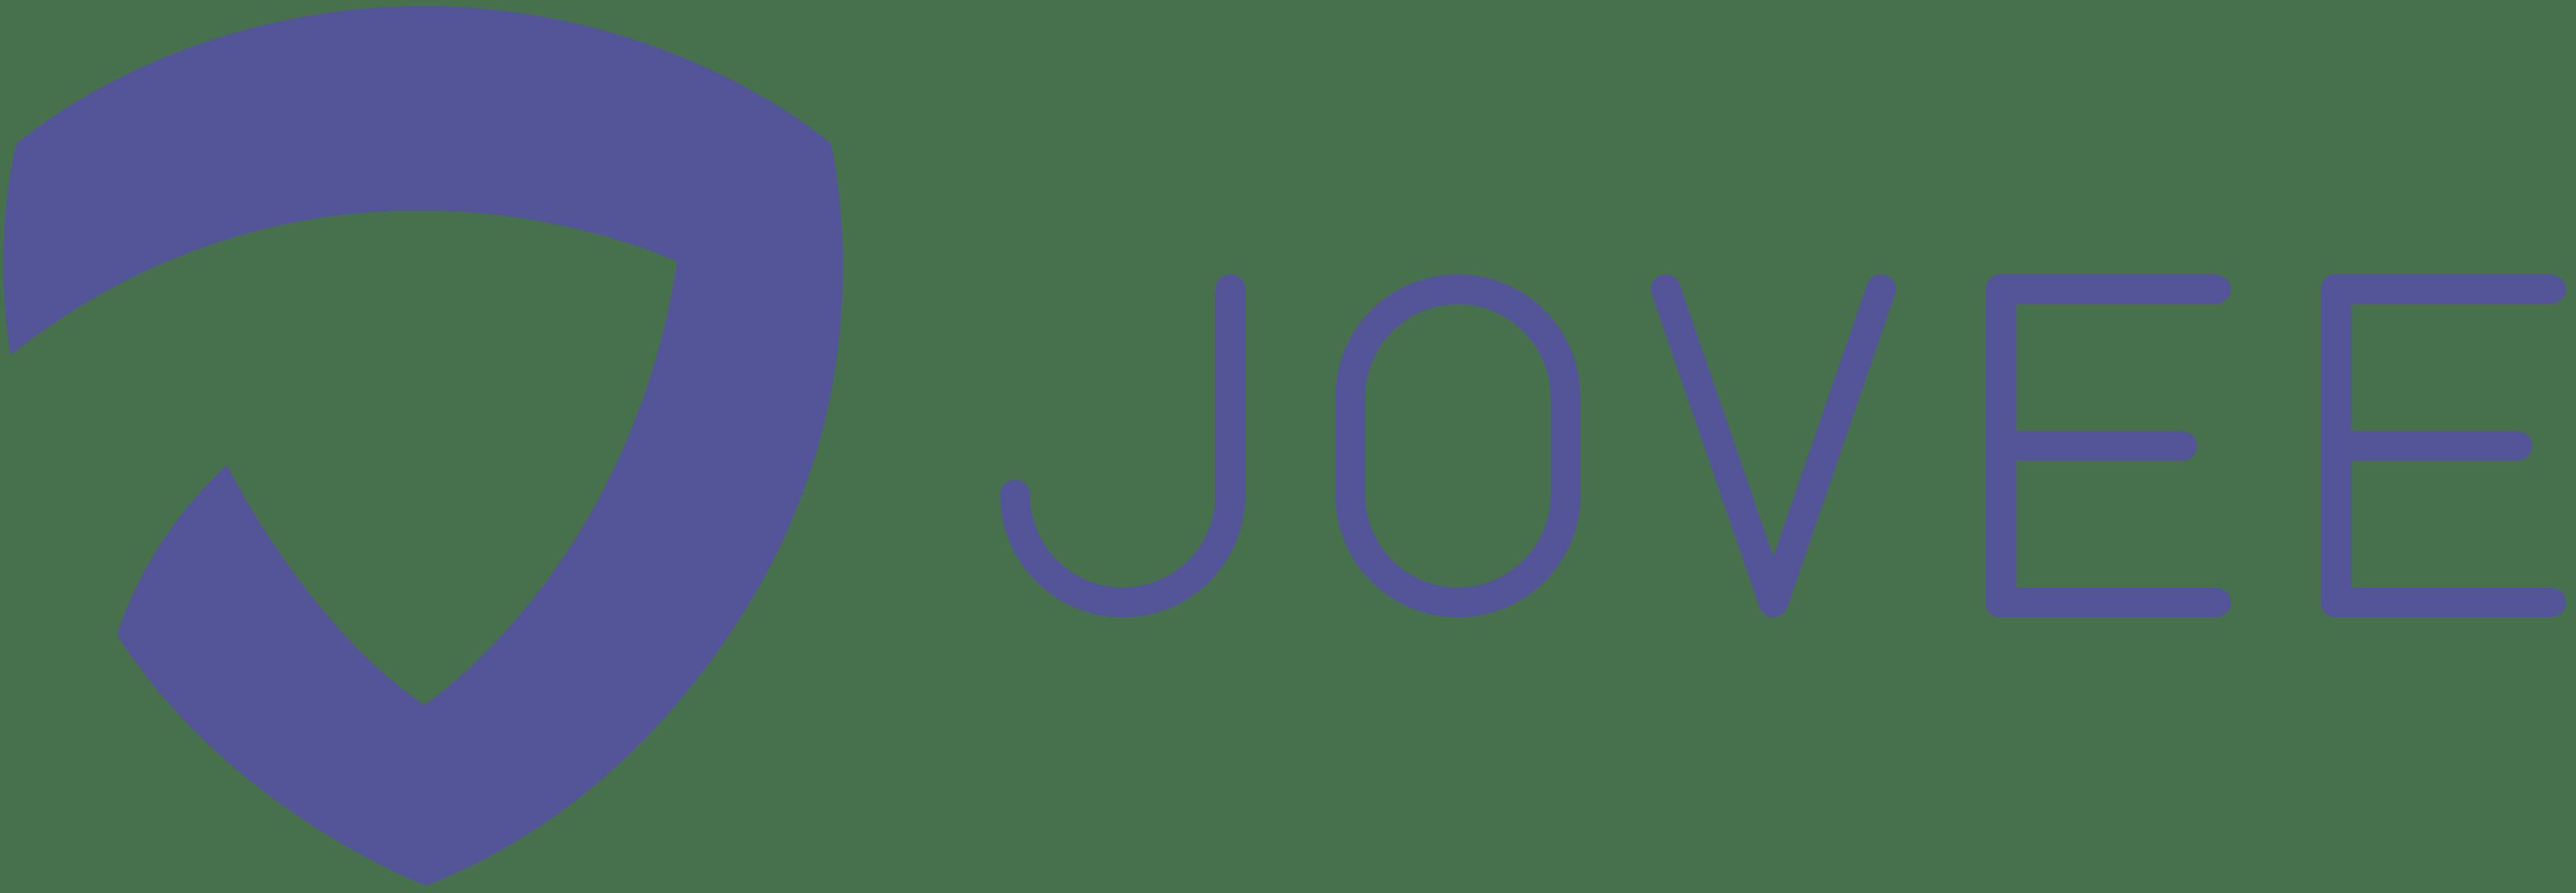 jovee-logo